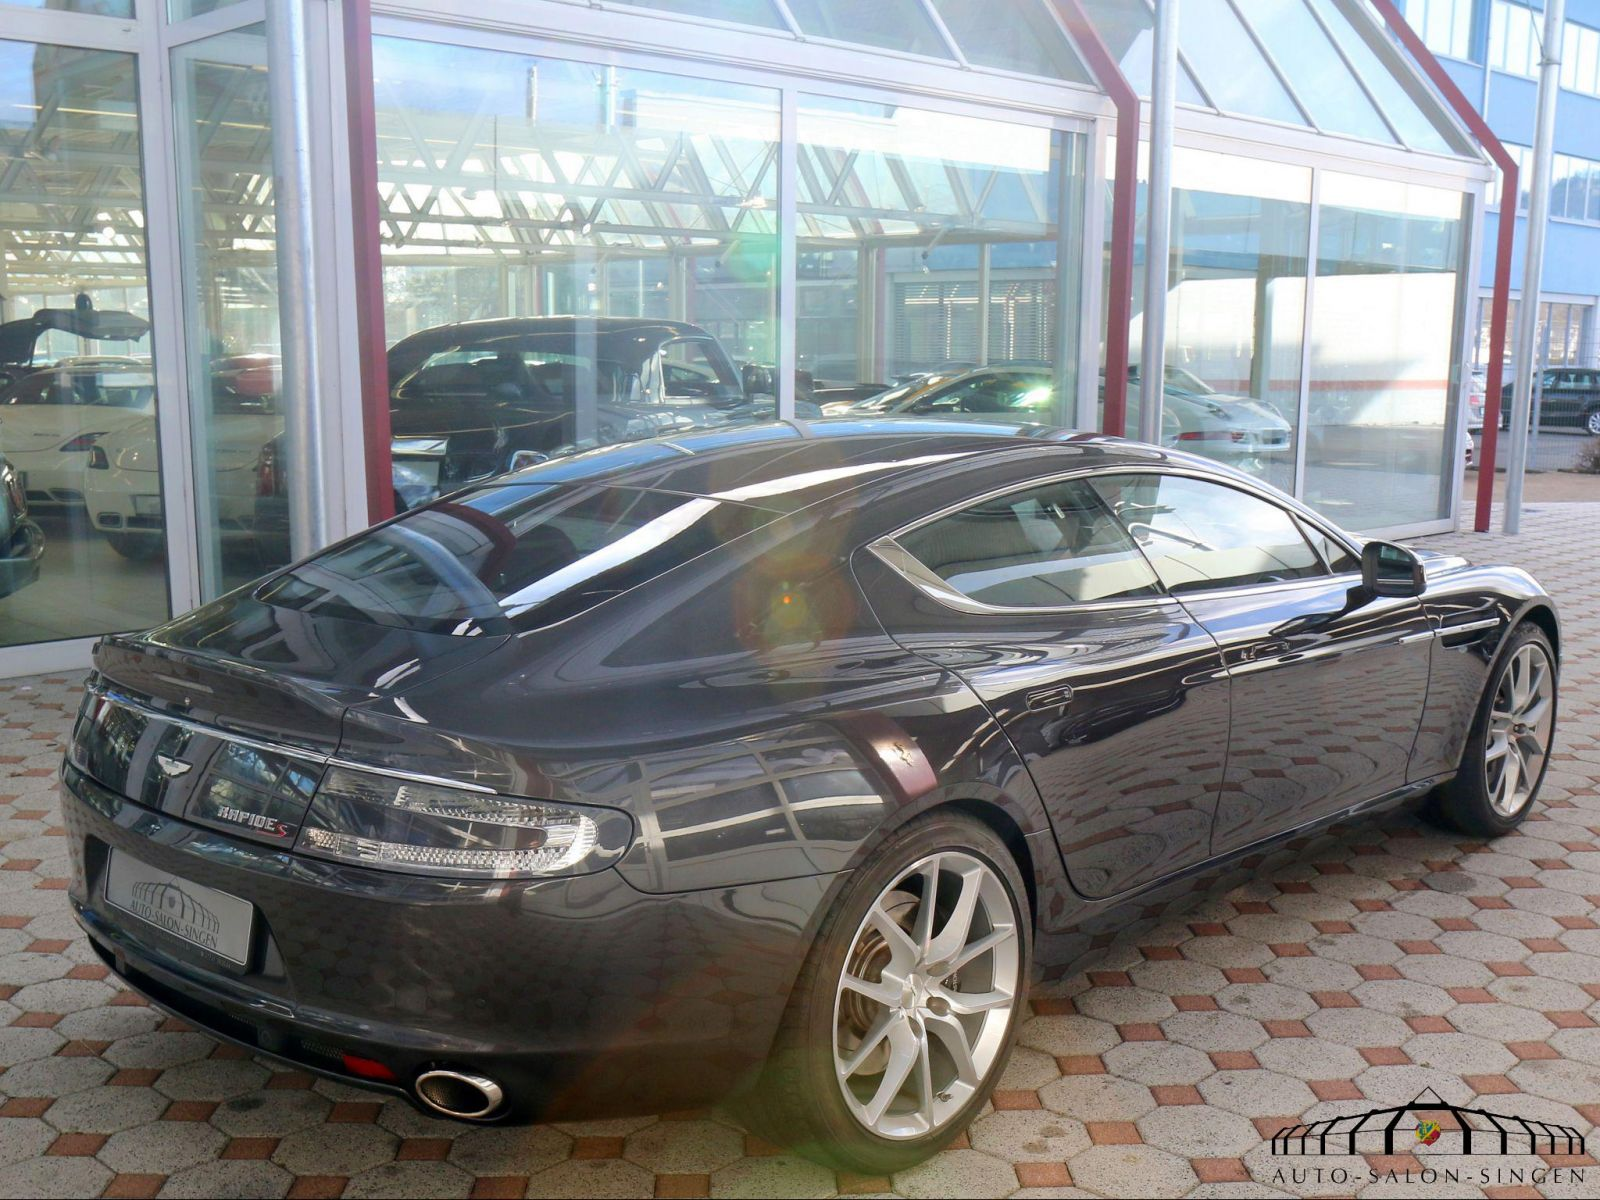 Aston Martin Rapide S Limousine Auto Salon Singen